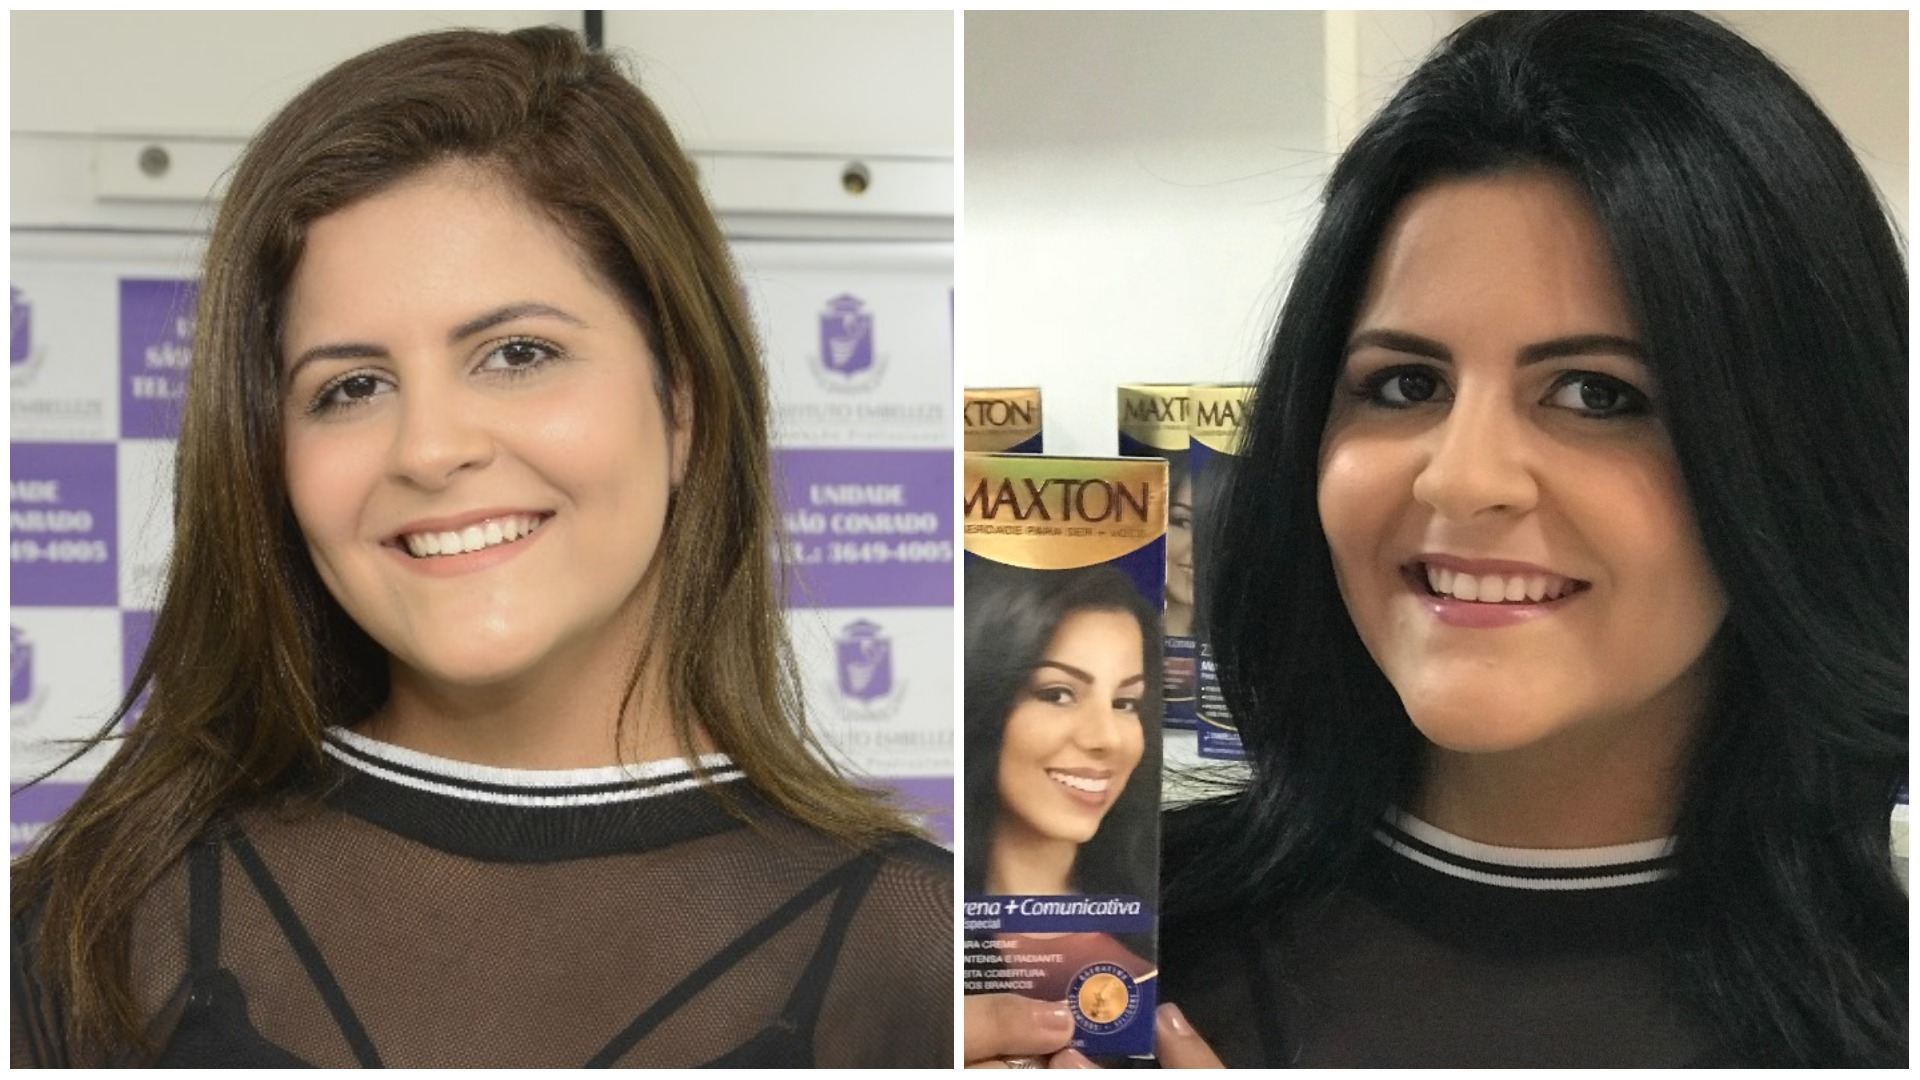 bonde das morenas maxton: andressa loureiro - antes e depois